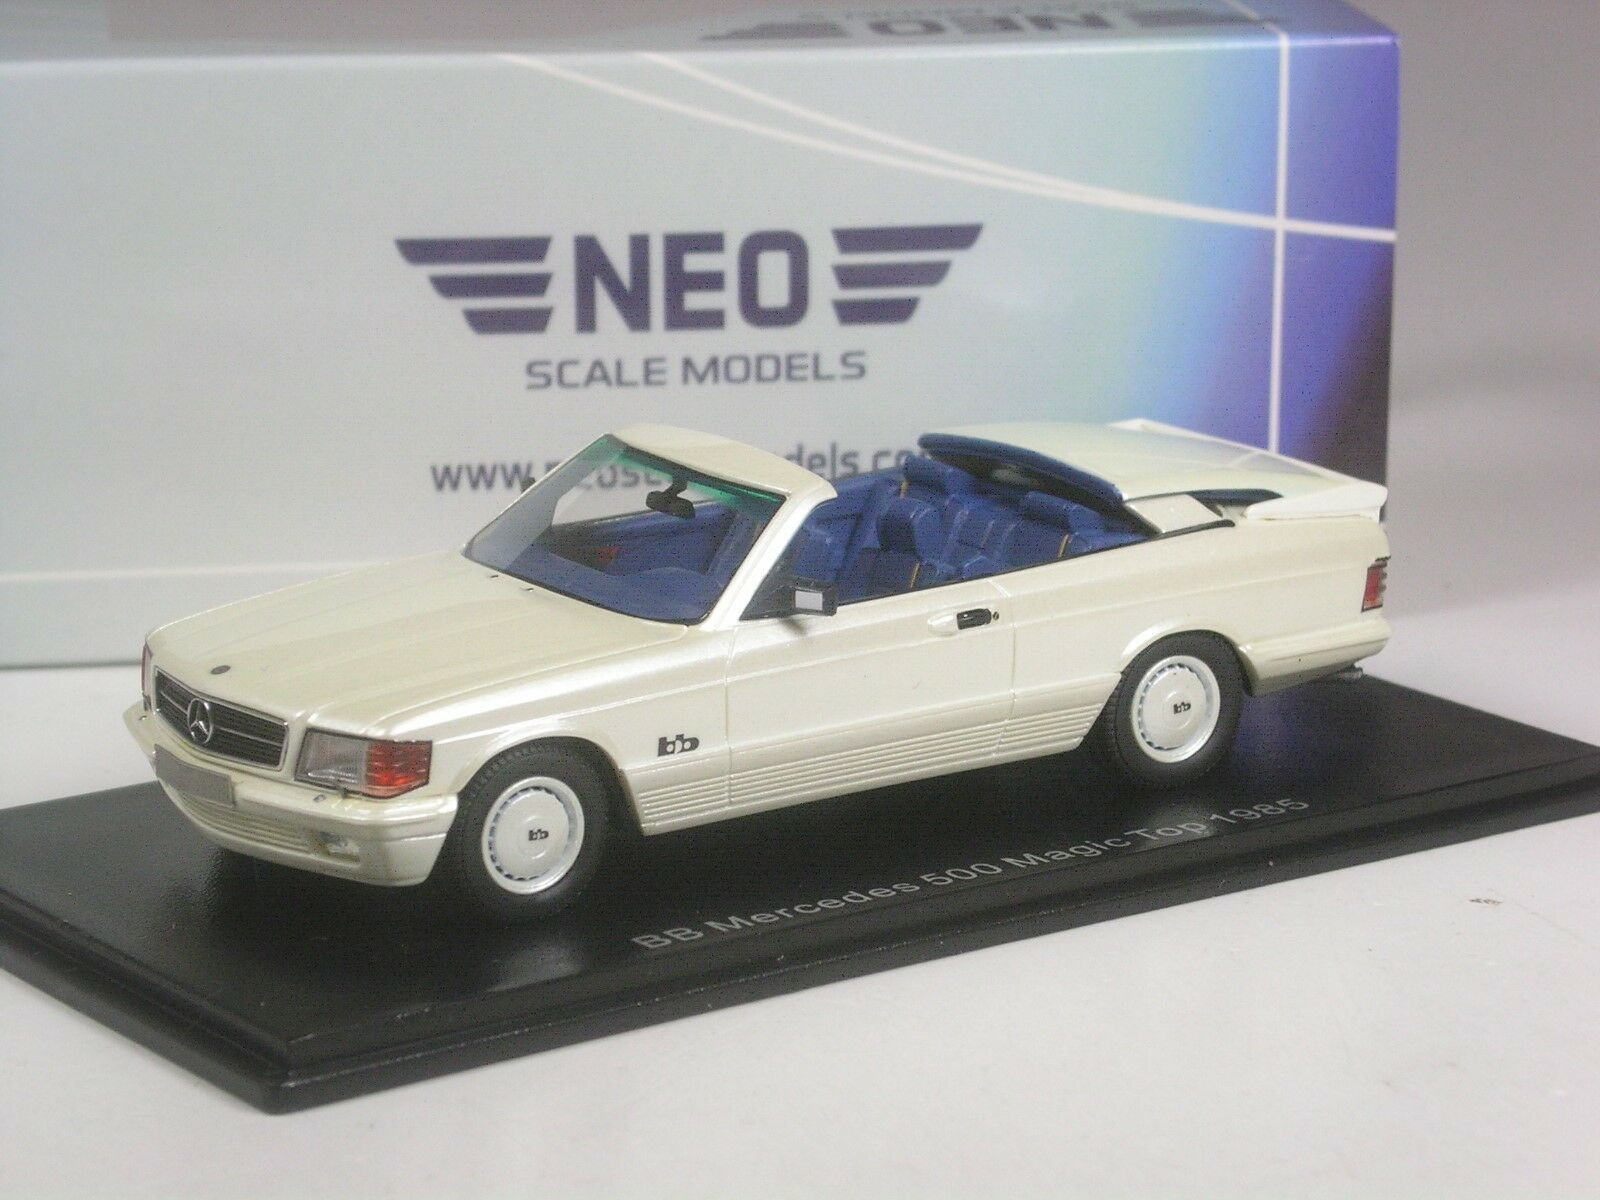 (ki-06-19) neo scale models bb mercedes 500 sec cabriolet 1985 en 1 43 en OVP